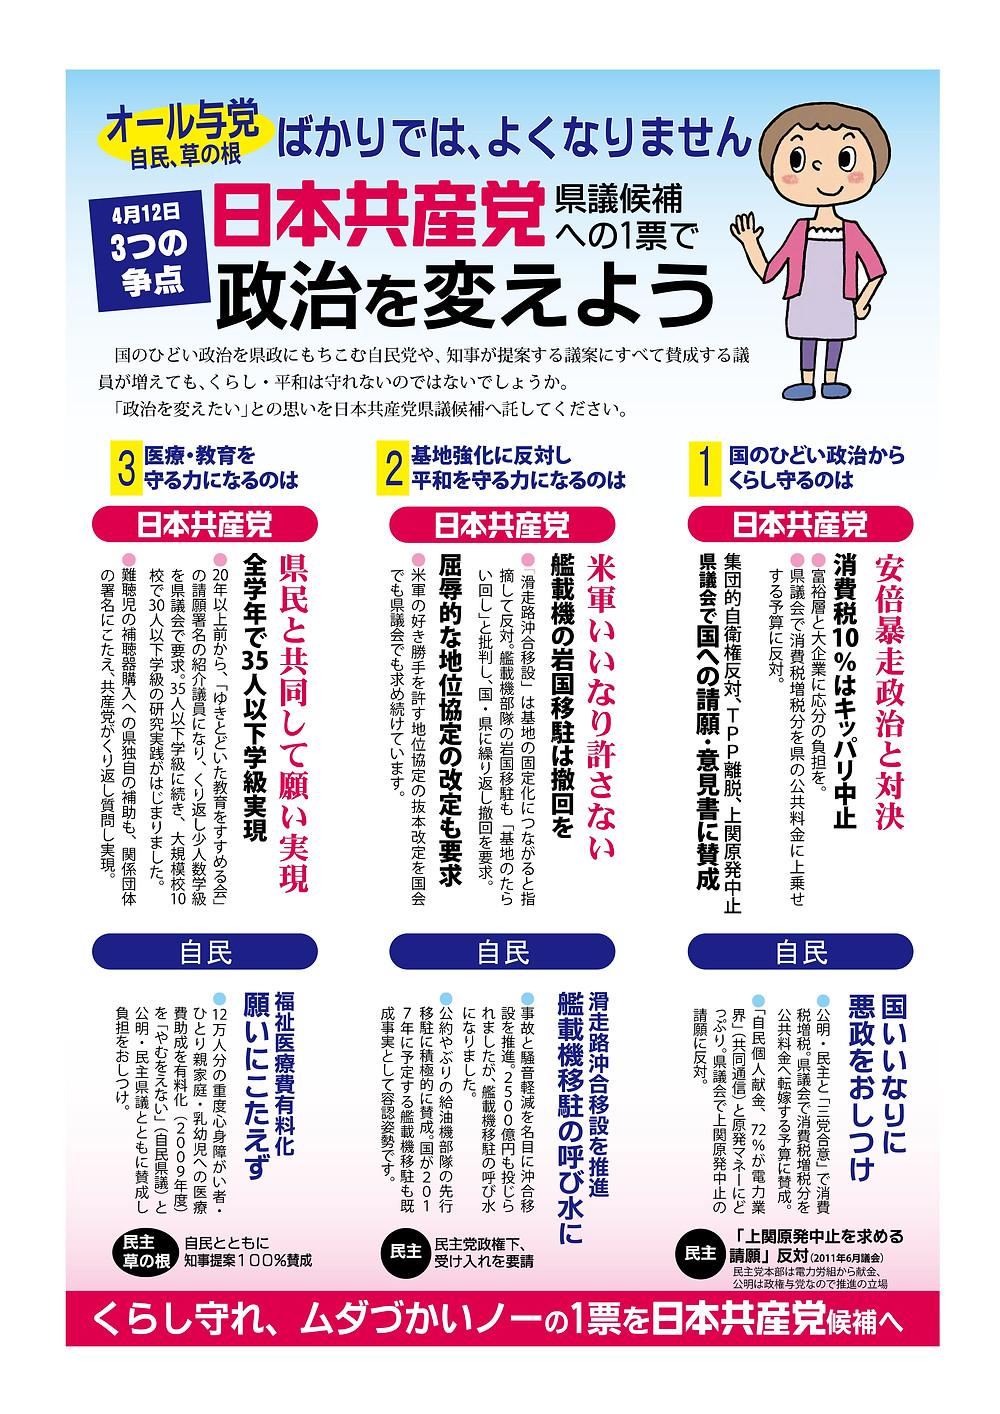 201504山口県議選法定2号ビラ裏_ol.jpg